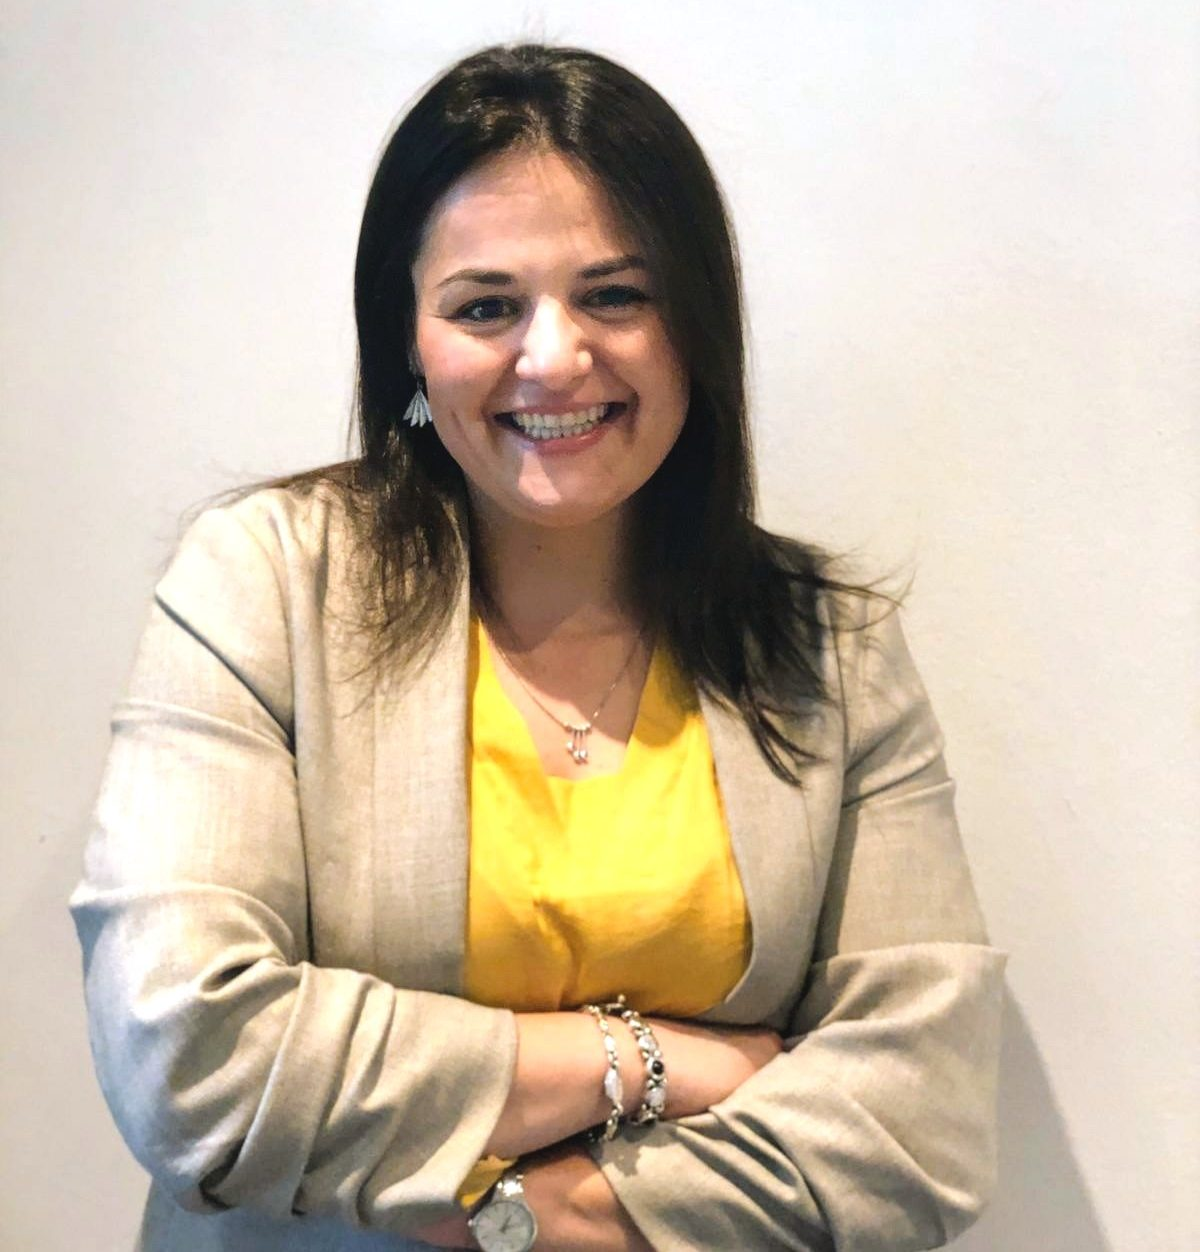 Elena Herráez Collado